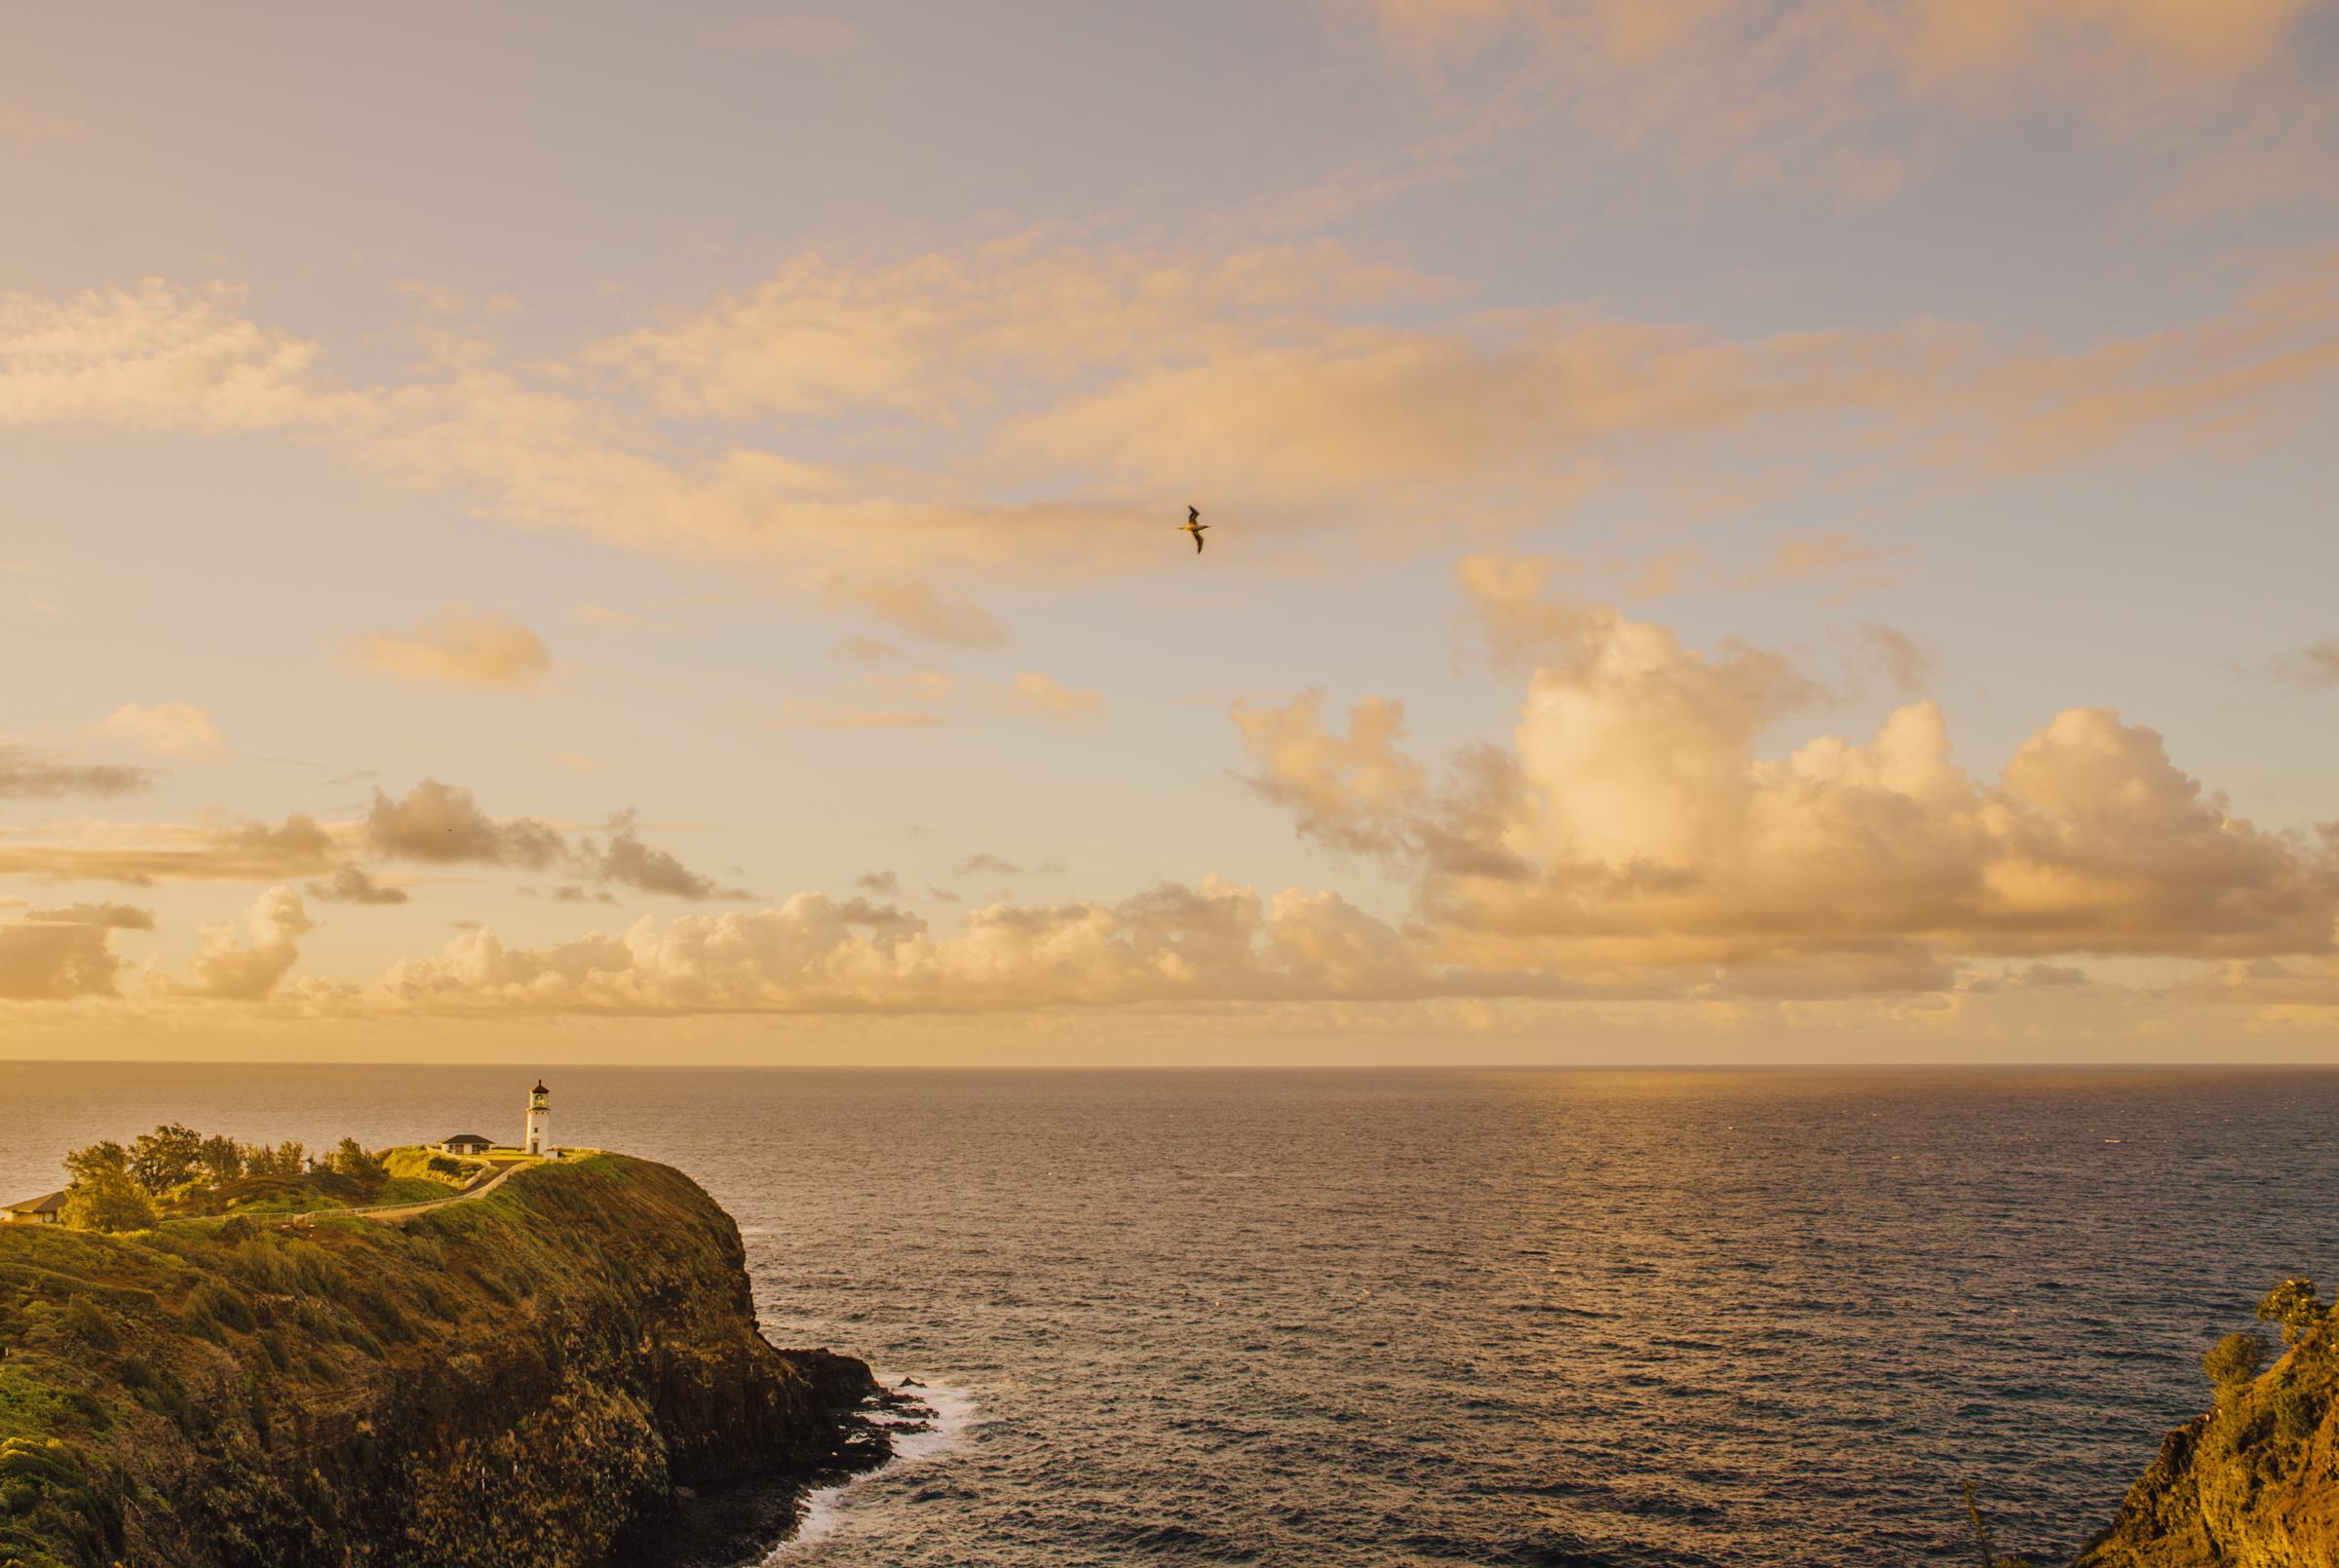 IMG_2260-WEB-KAUAI-HAWAII-SUNSET-JENNIFER-PICARD-PHOTOGRAPHY.jpg